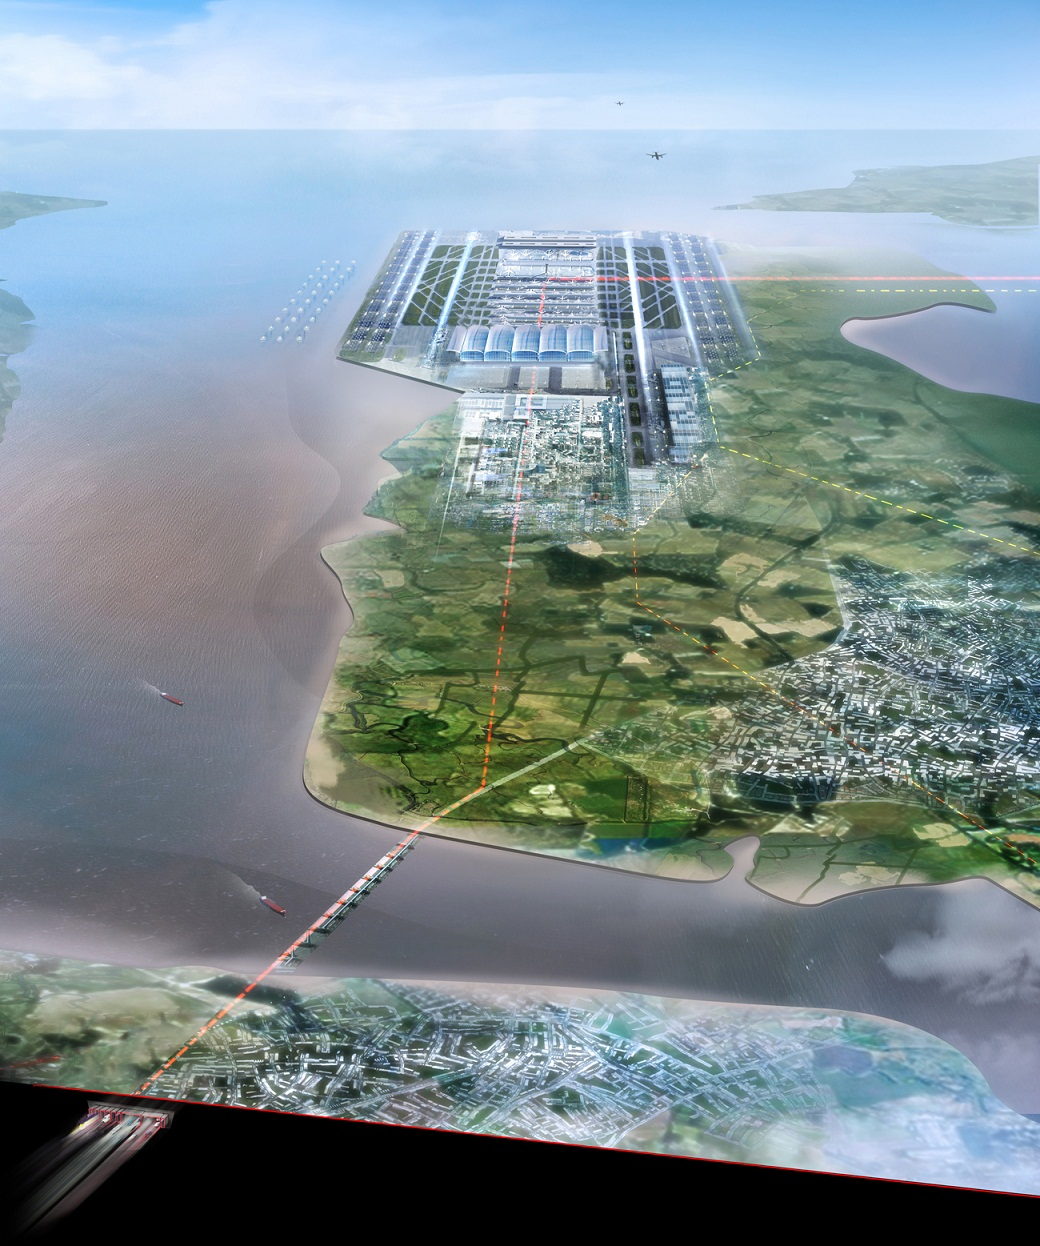 master-plan-aeroport-londres-tamise